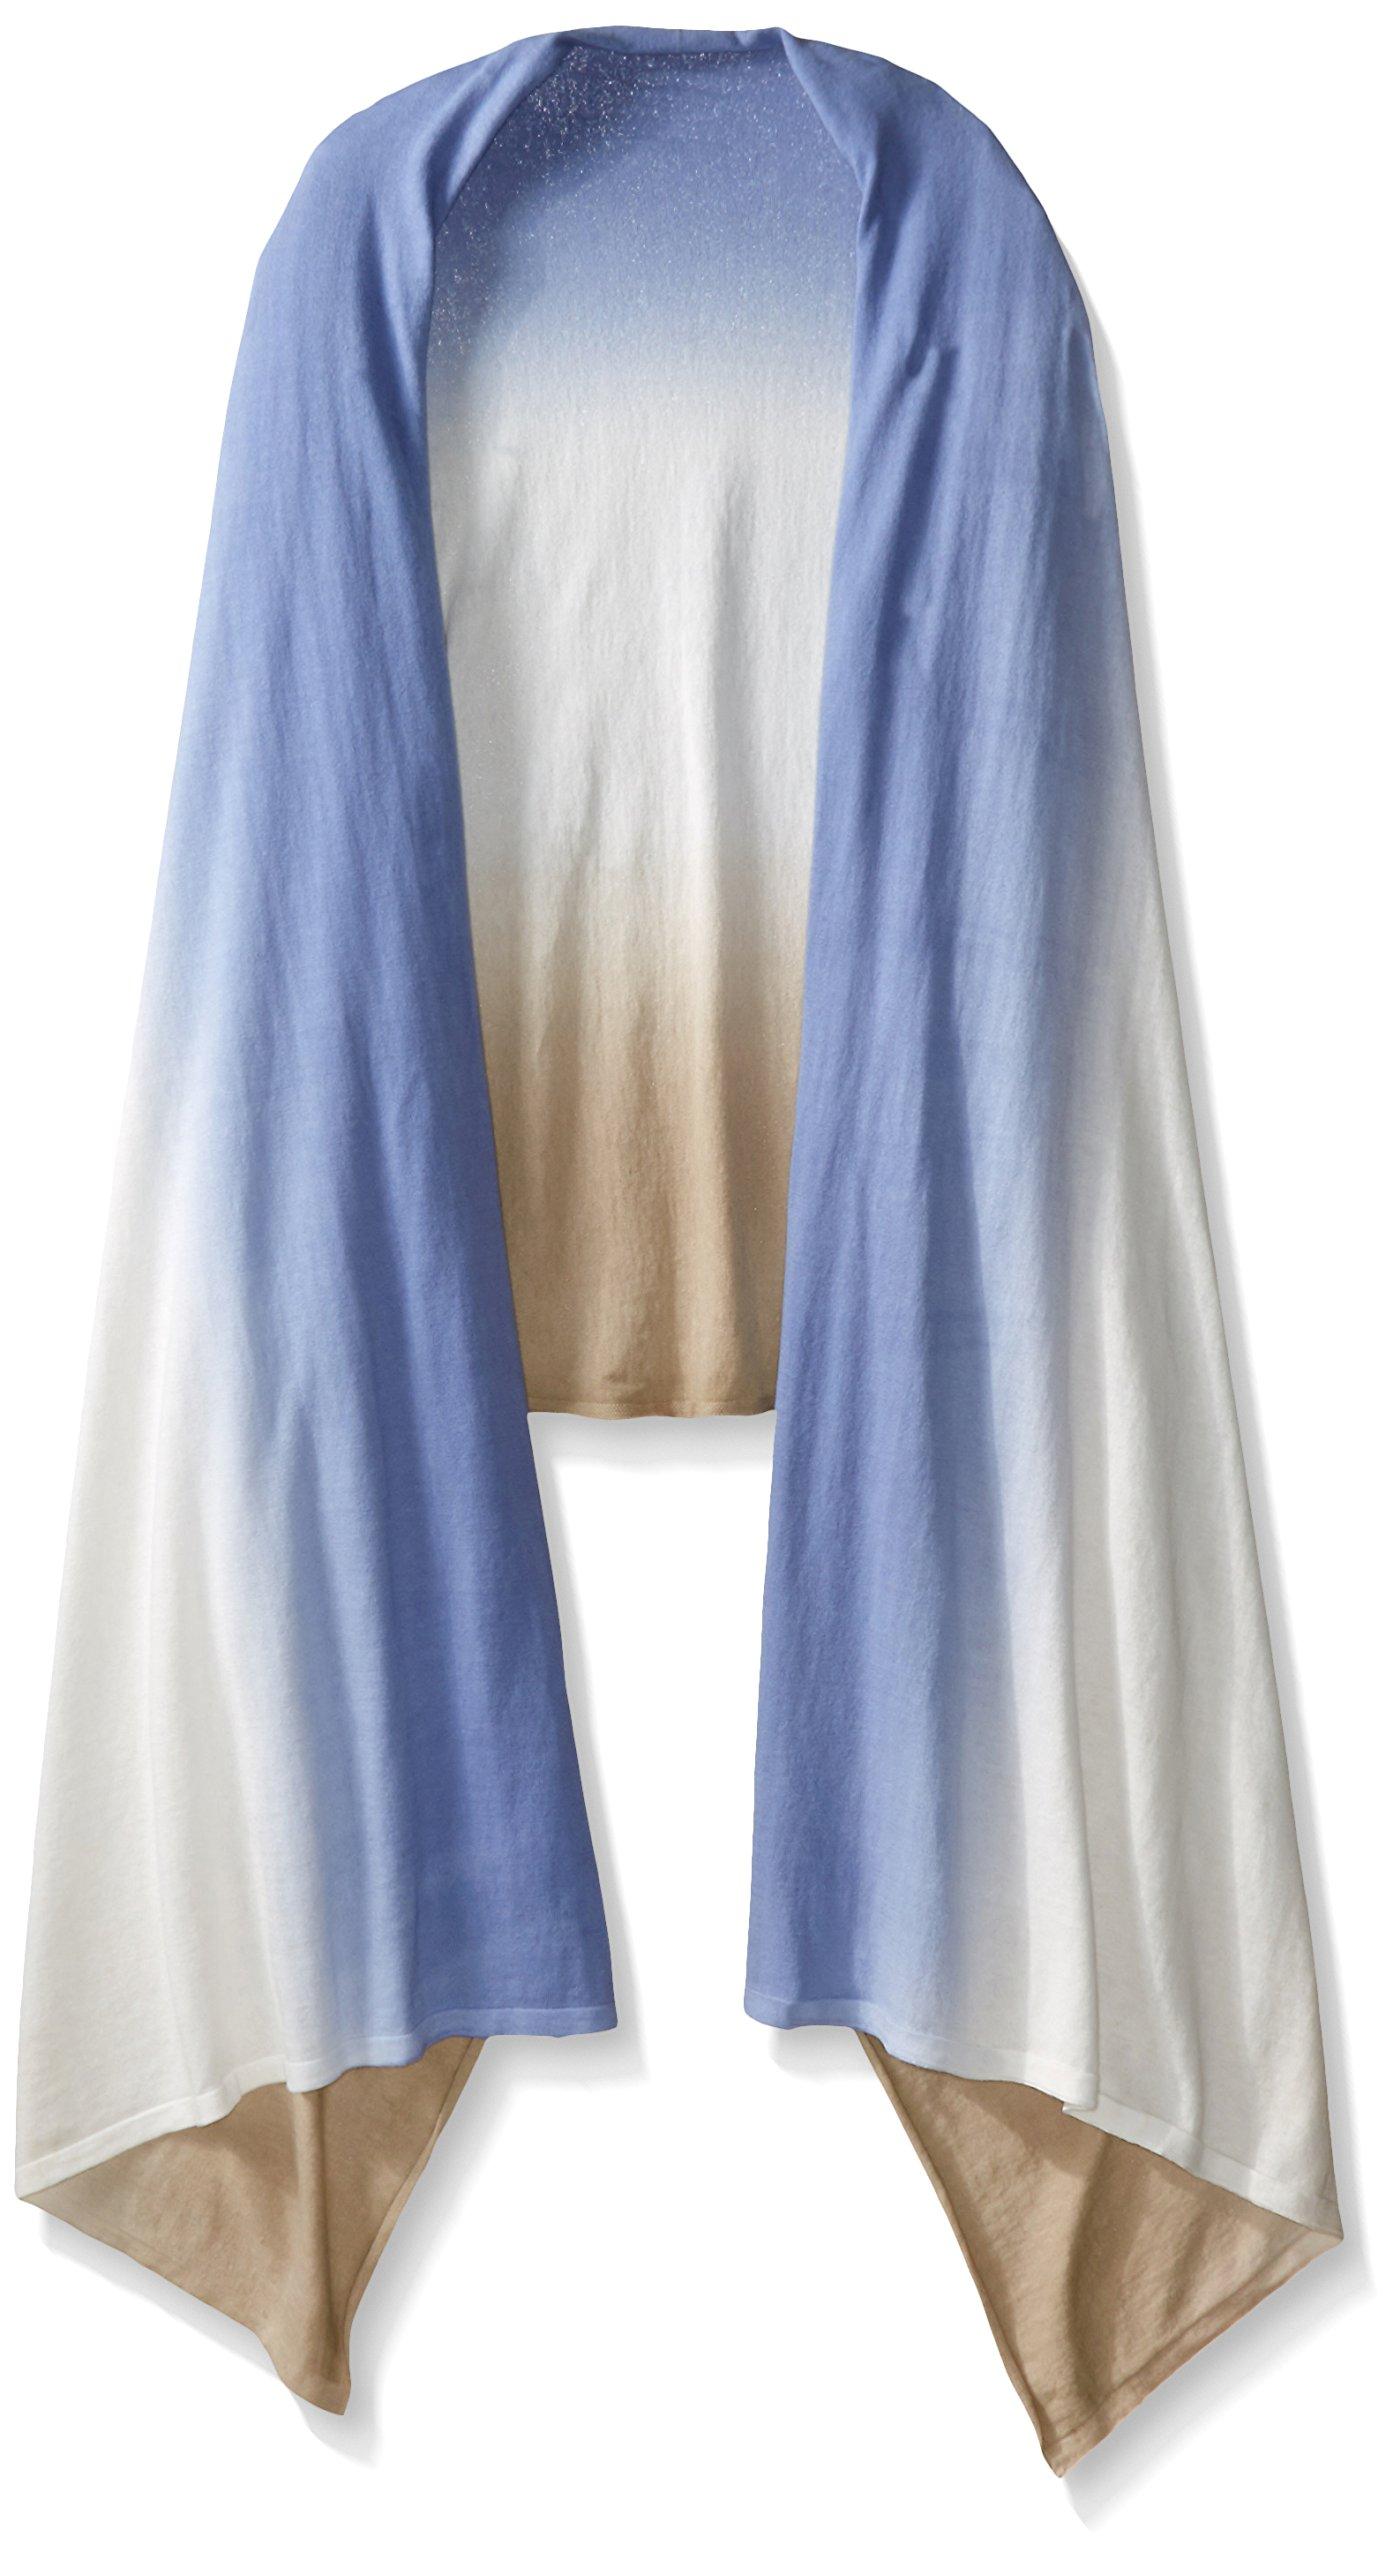 Minnie Rose Women's Cotton Double Dip Dye Blankie Wrap, Sandstone/Lace Agate, One Size